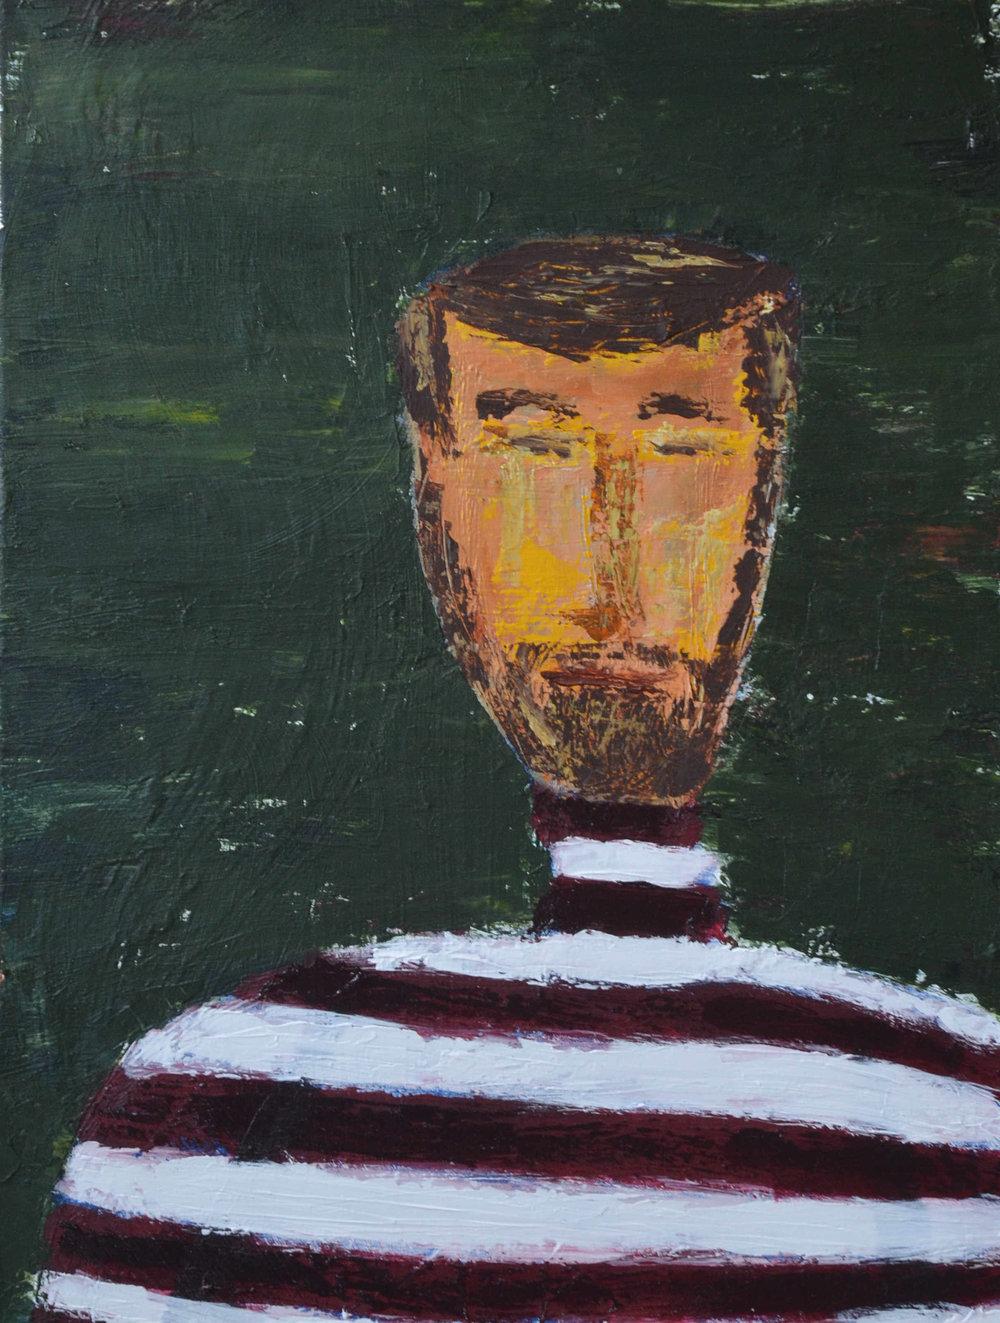 Man in Striped Shirt